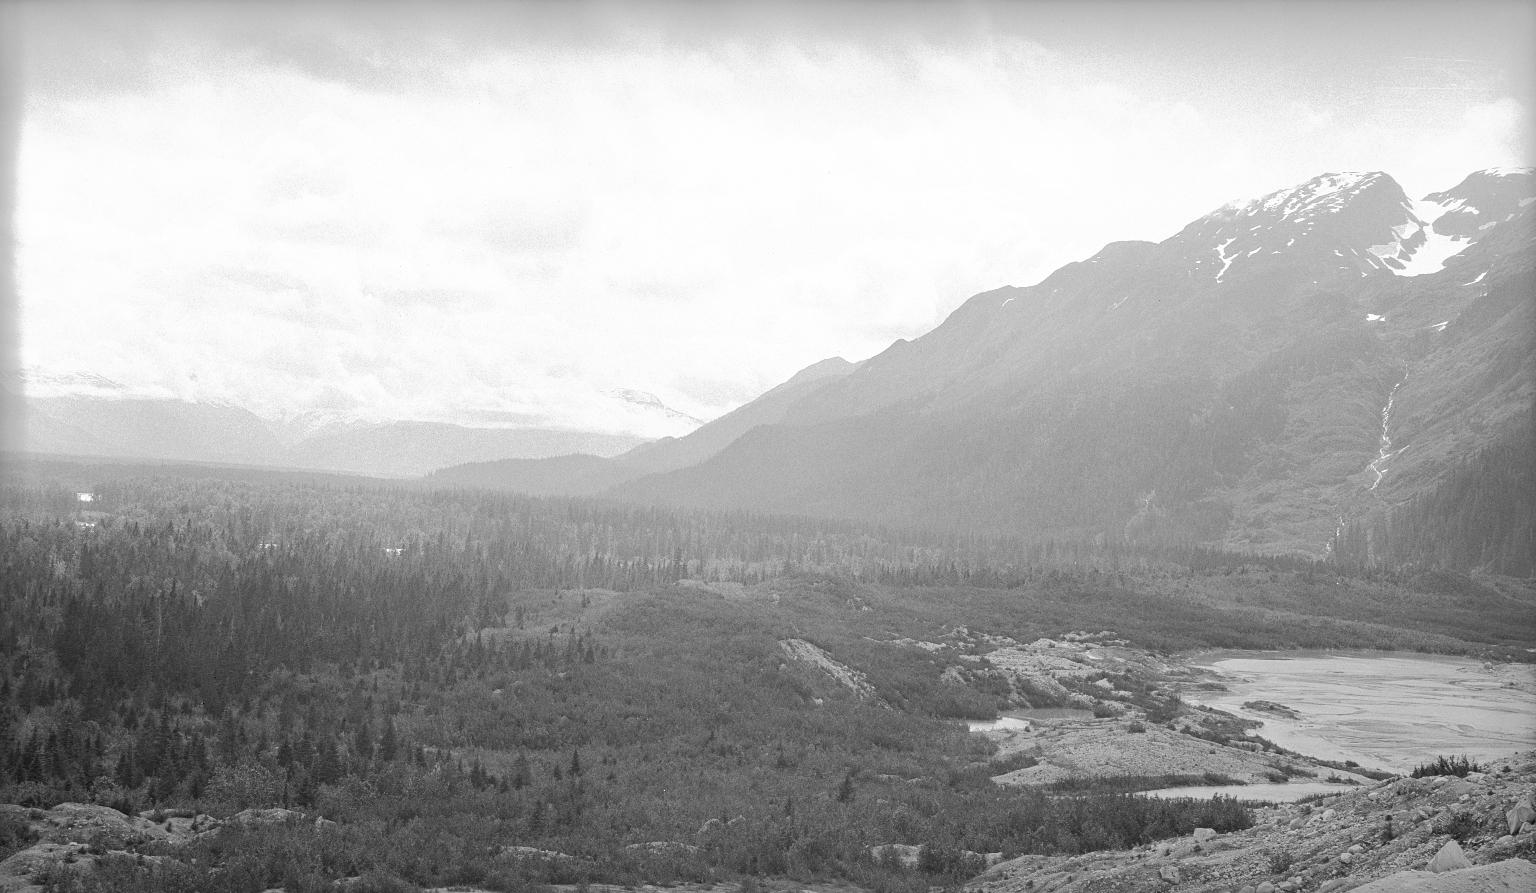 Moraine of Great Glacier, Alaska, United States and British Columbia, Canada